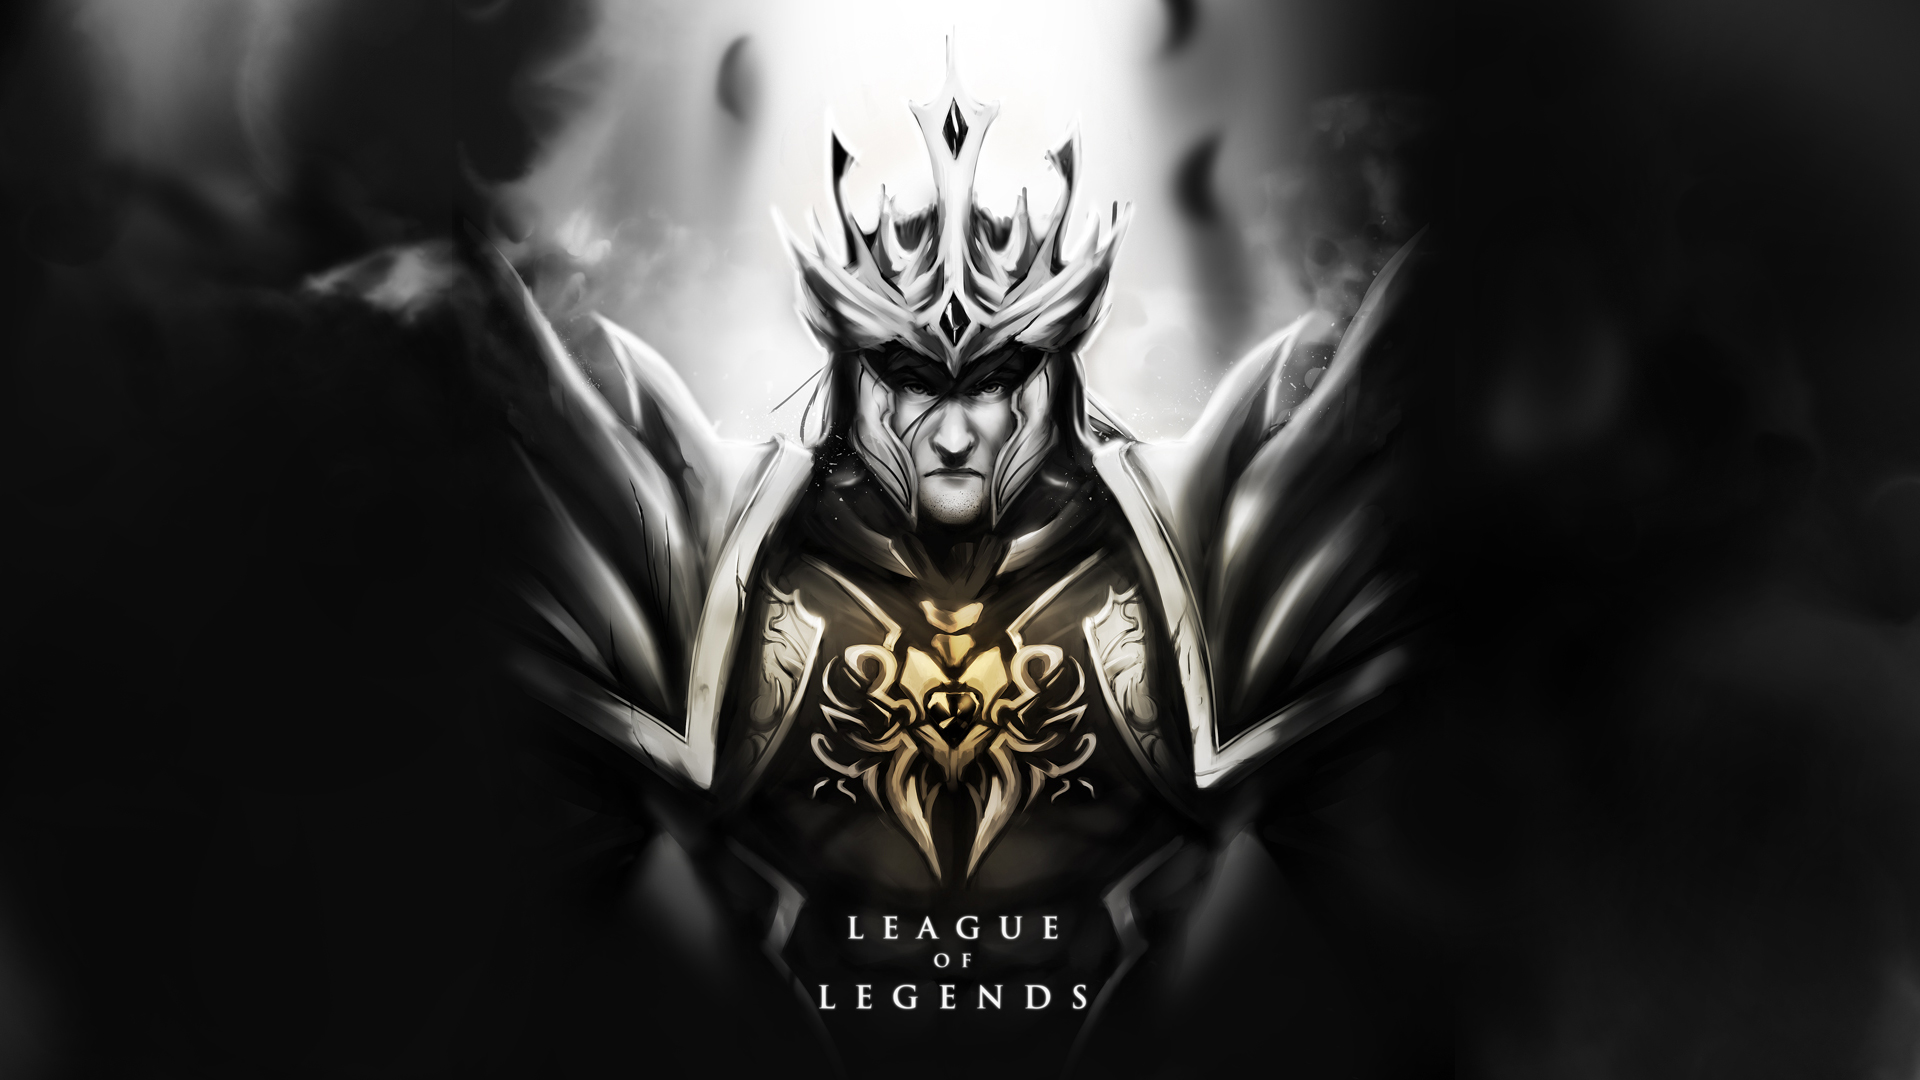 League of Legends wallpaper 97